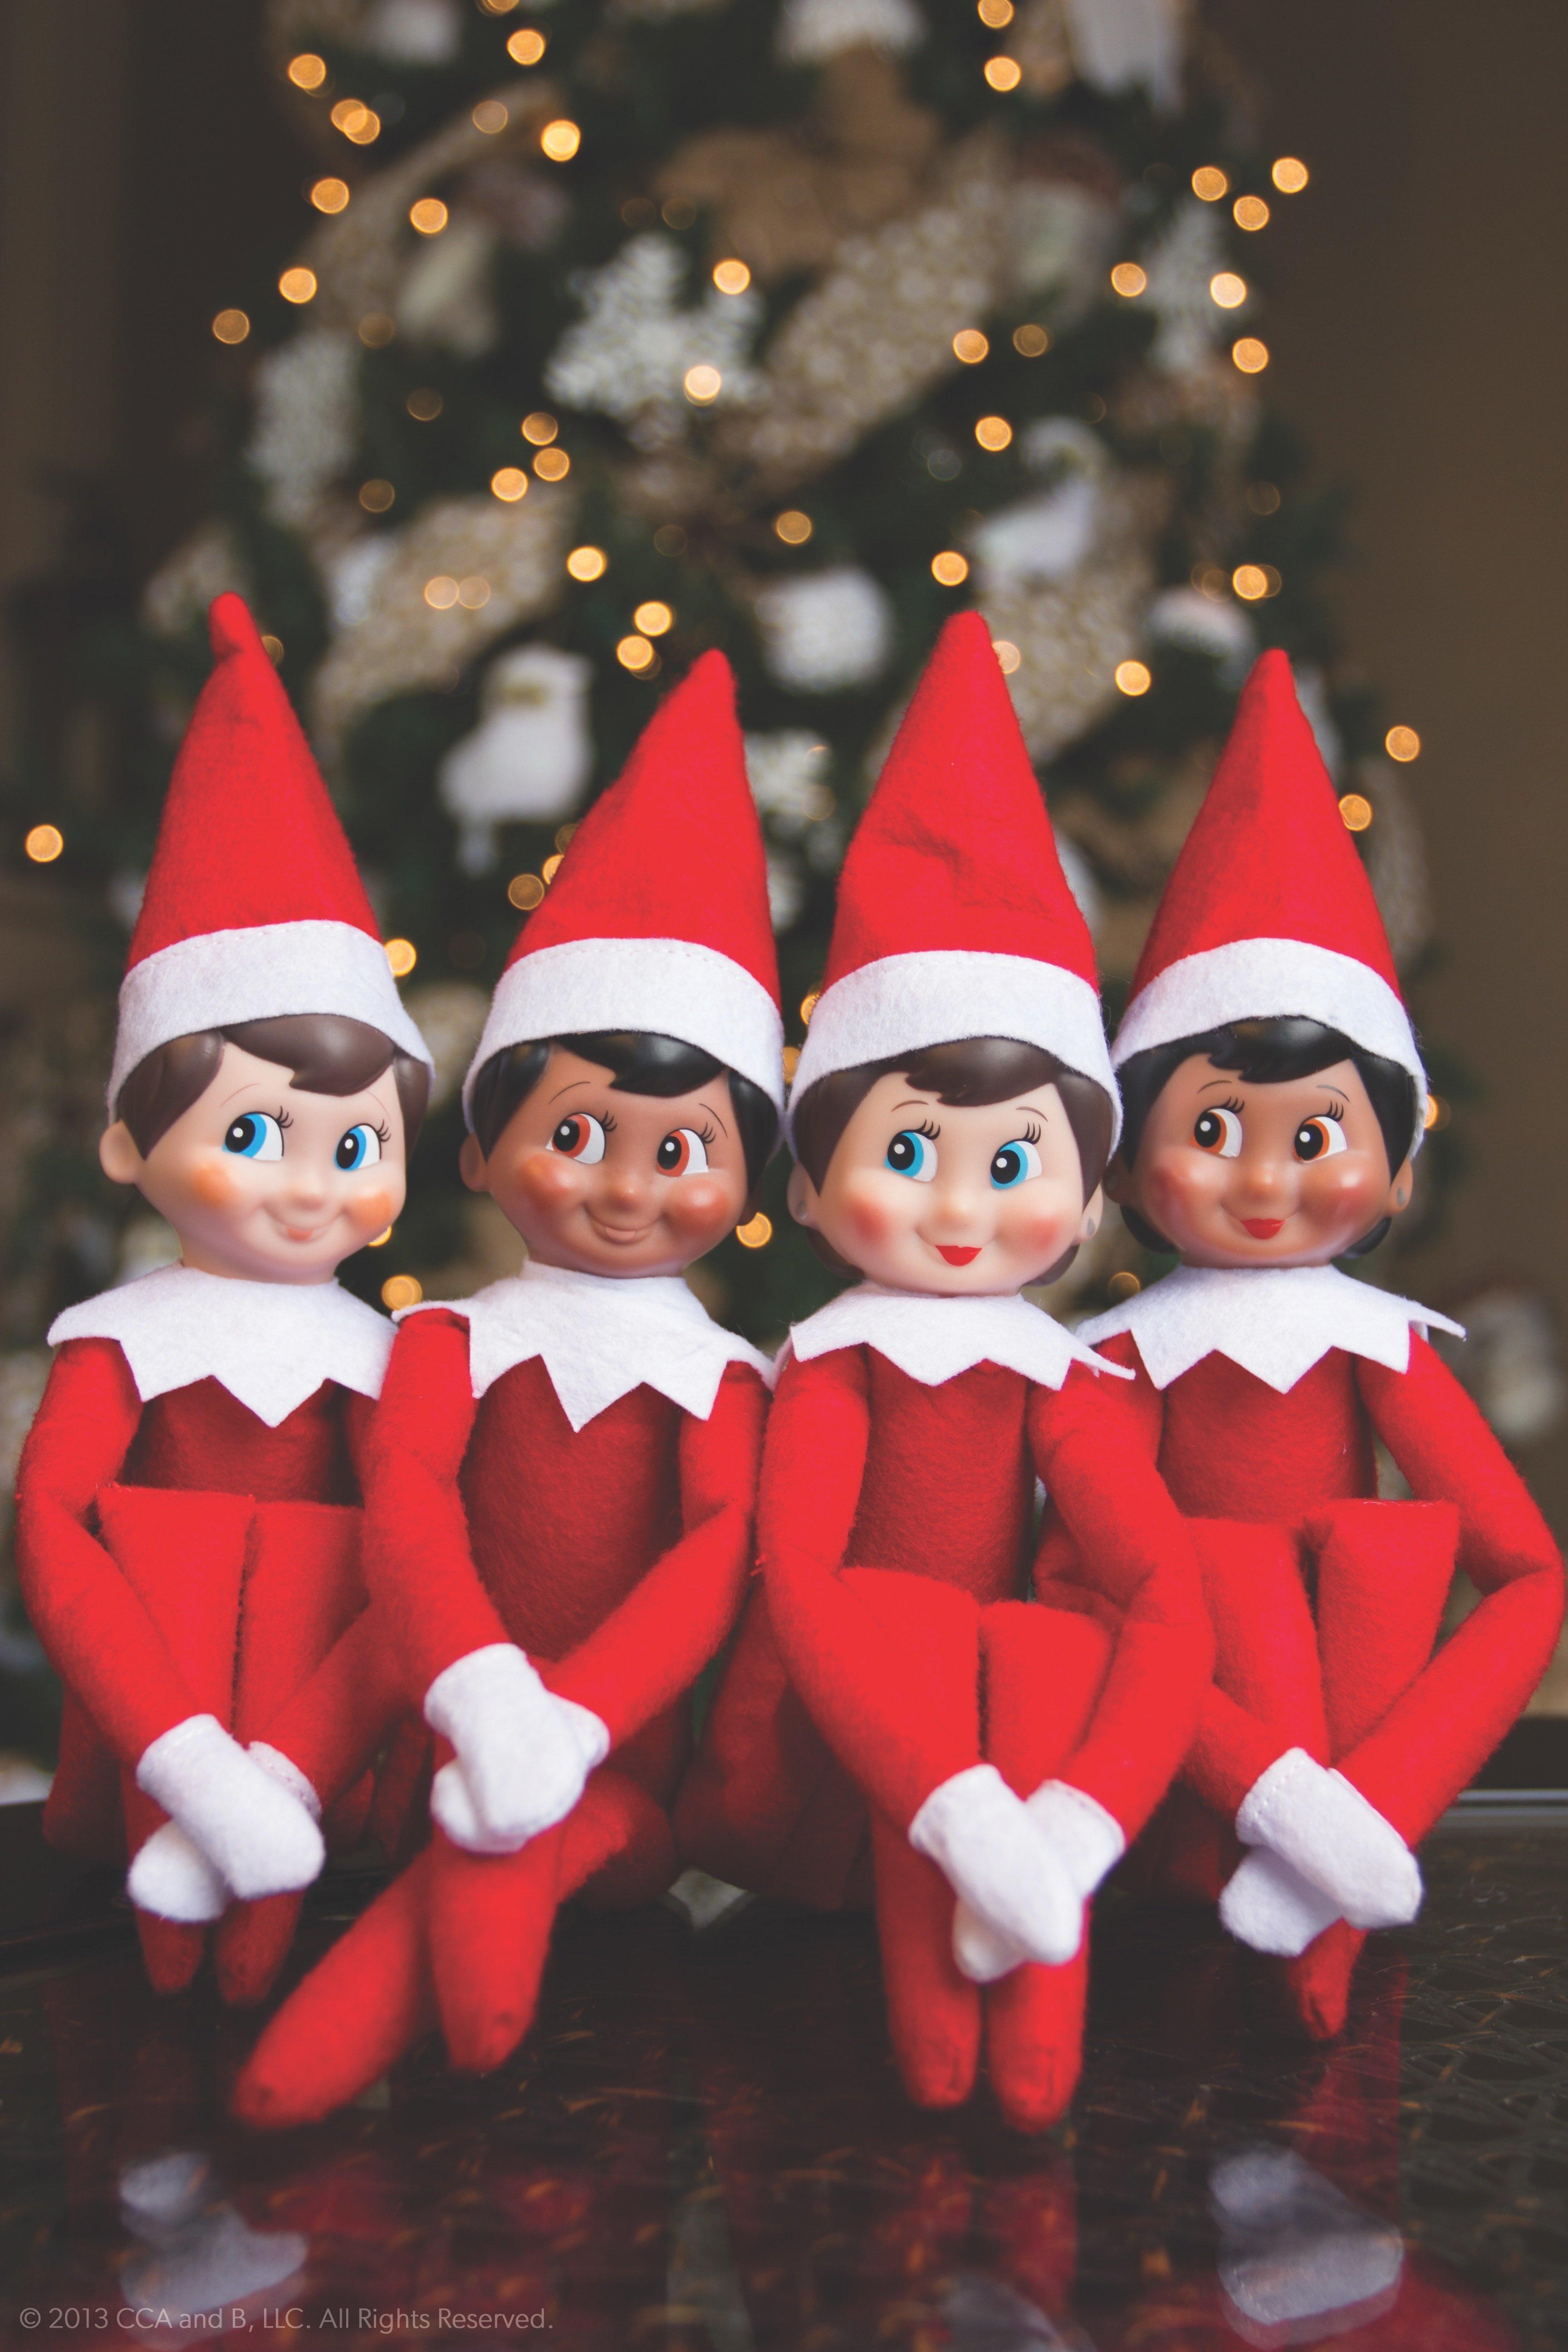 Christmas Elf On The Shelf Images.Downtown Elf On The Shelf Scavenger Hunt